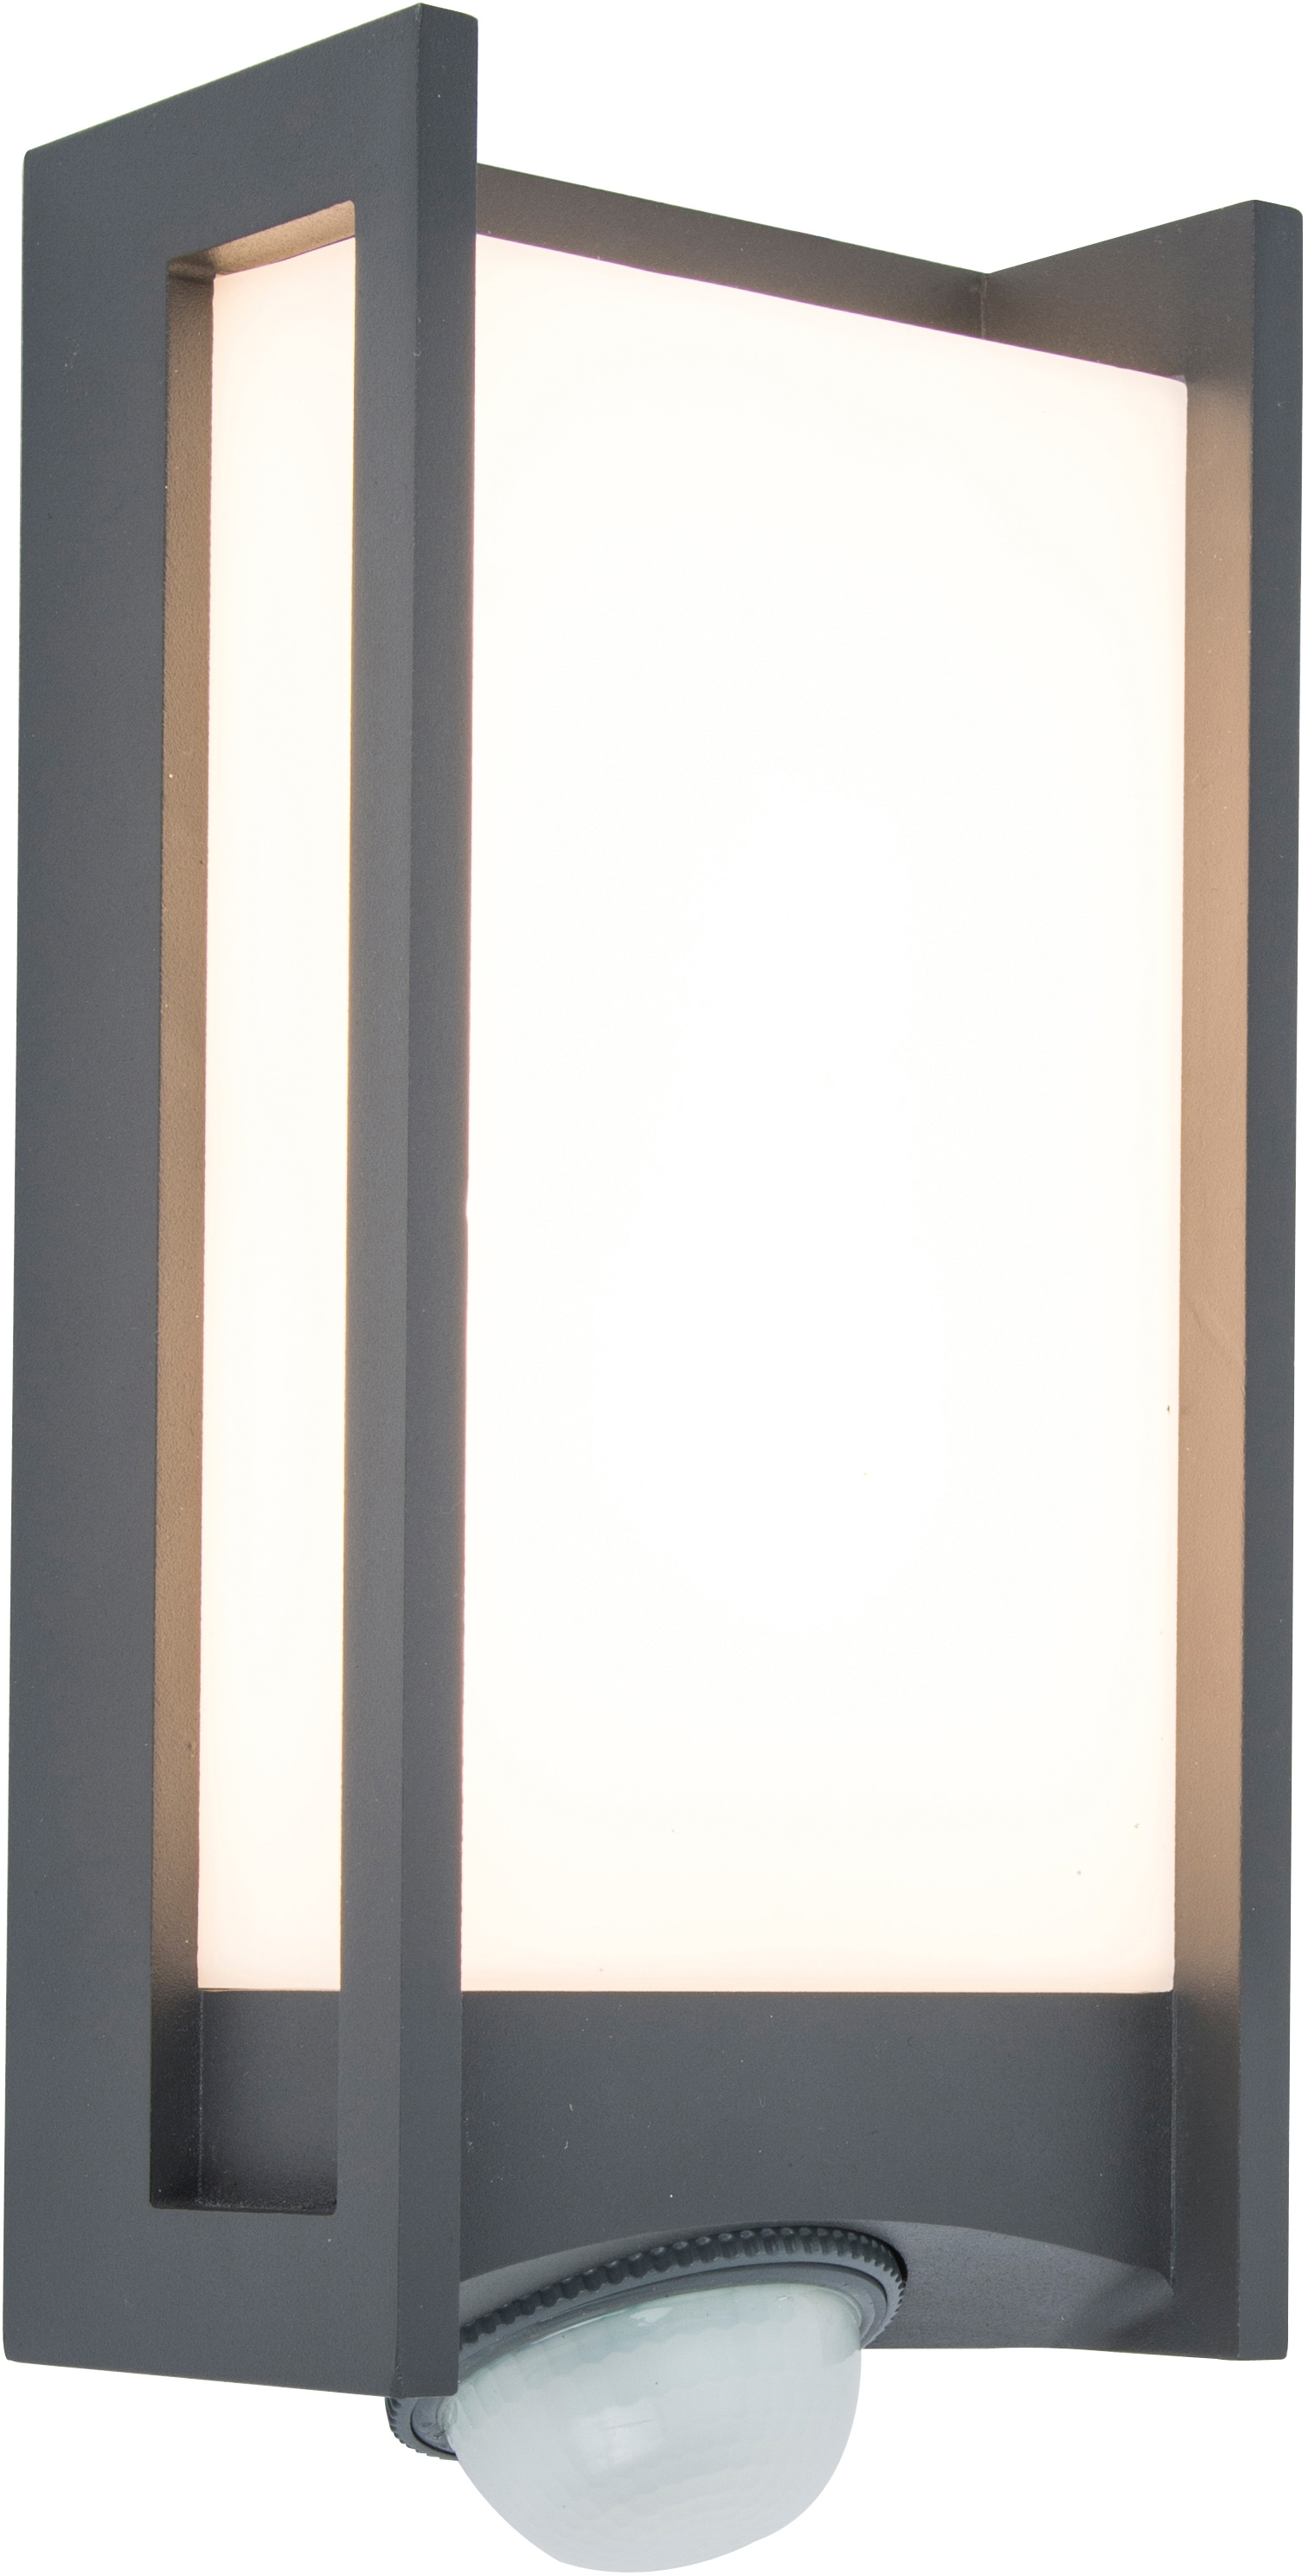 LUTEC LED Außen-Wandleuchte QUBO 5193002118, LED-Modul, 1 St., Warmweiß